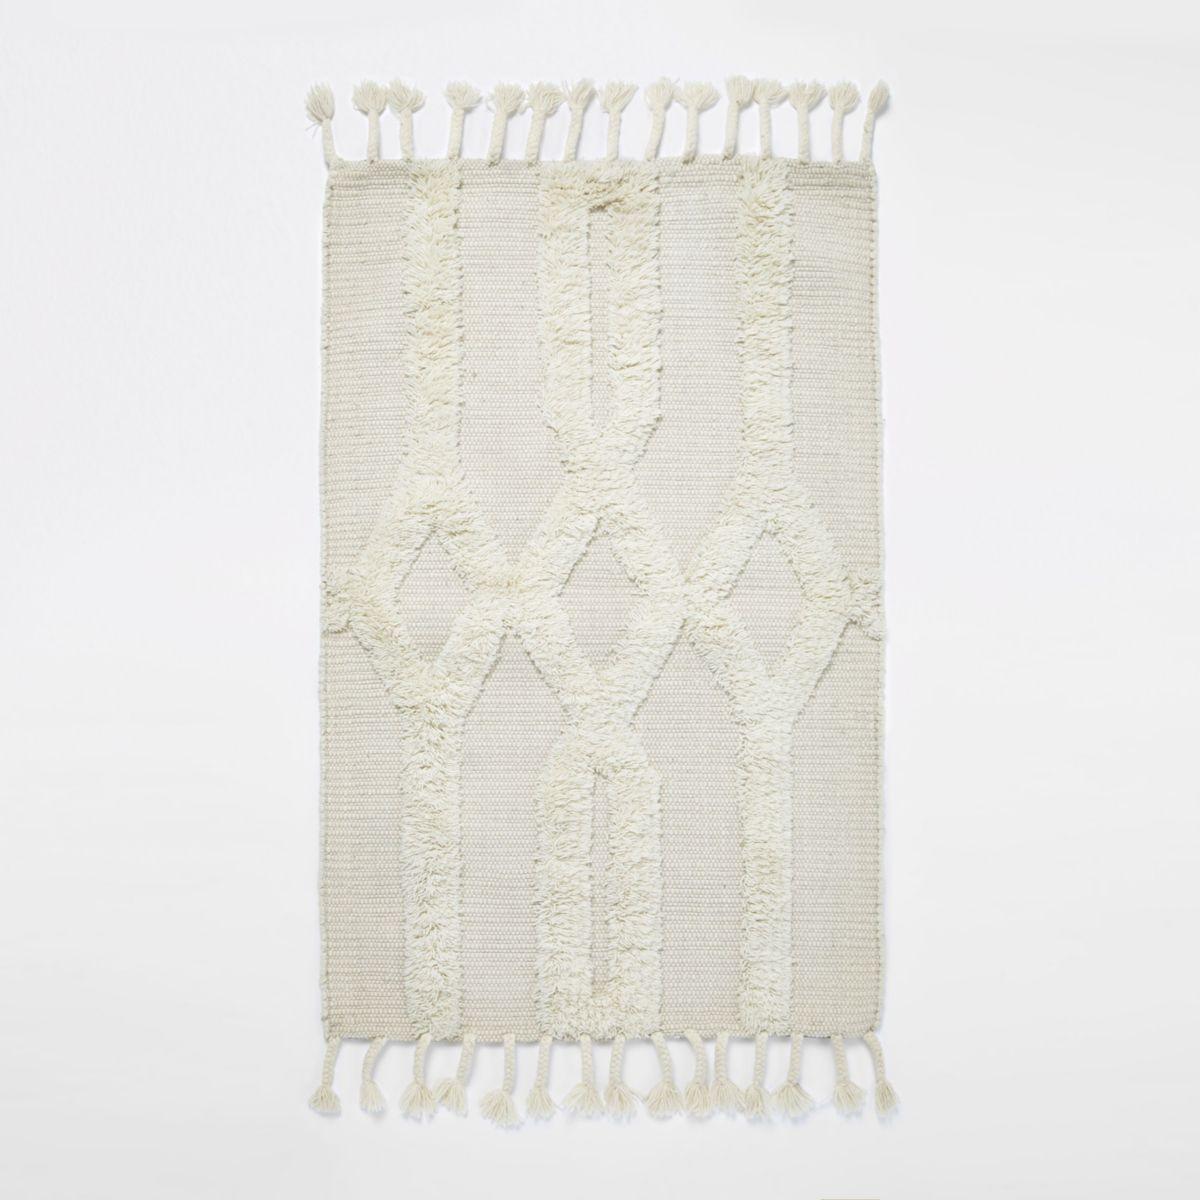 Cream tufted geometric rug